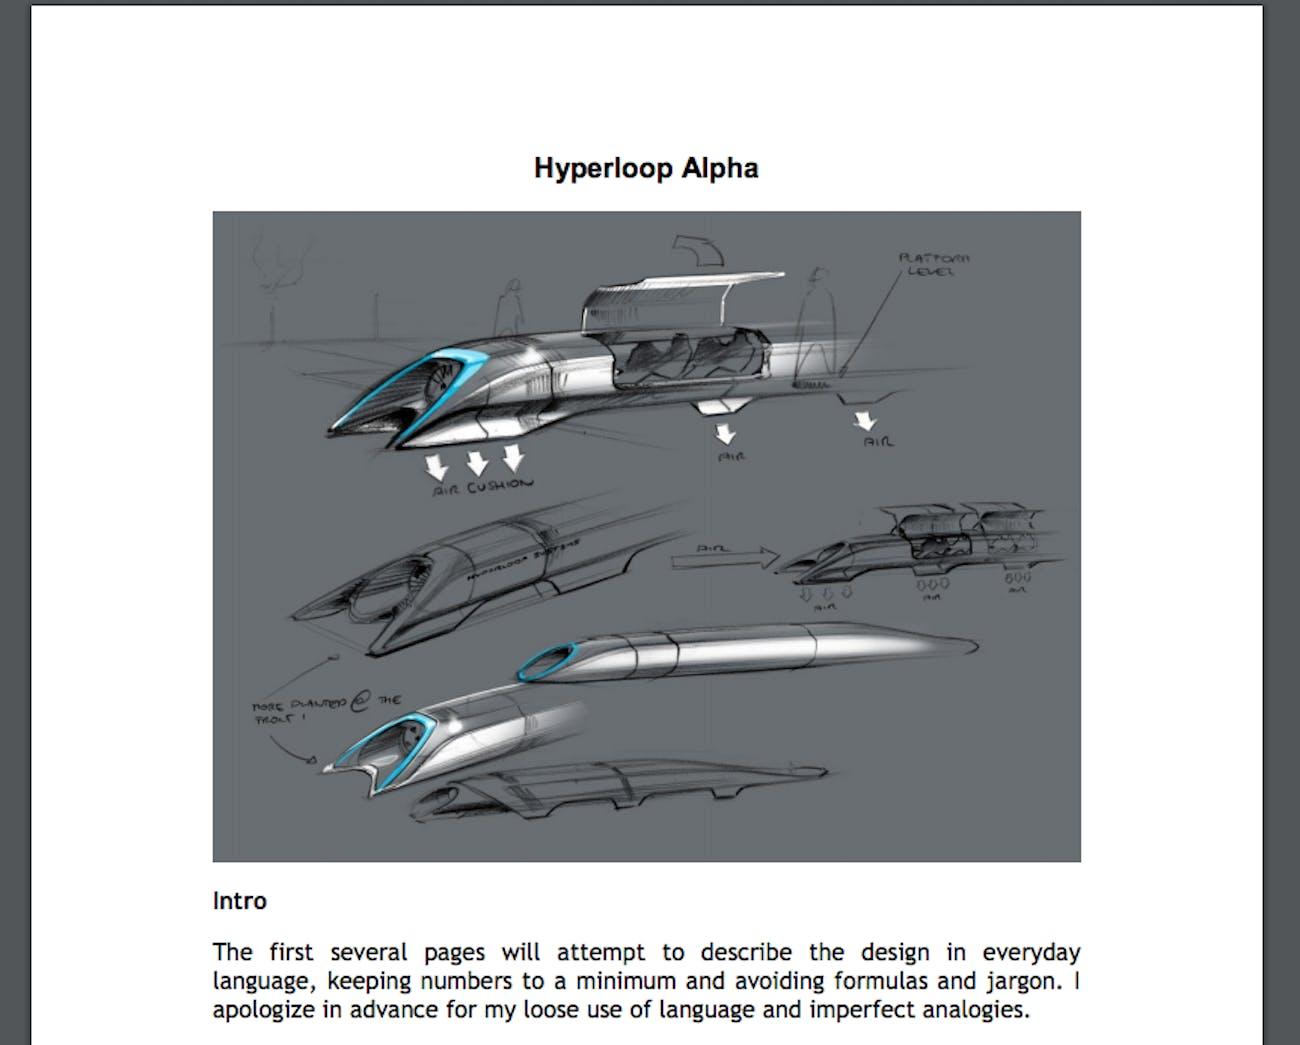 Hyperloop Alpha whitepaper